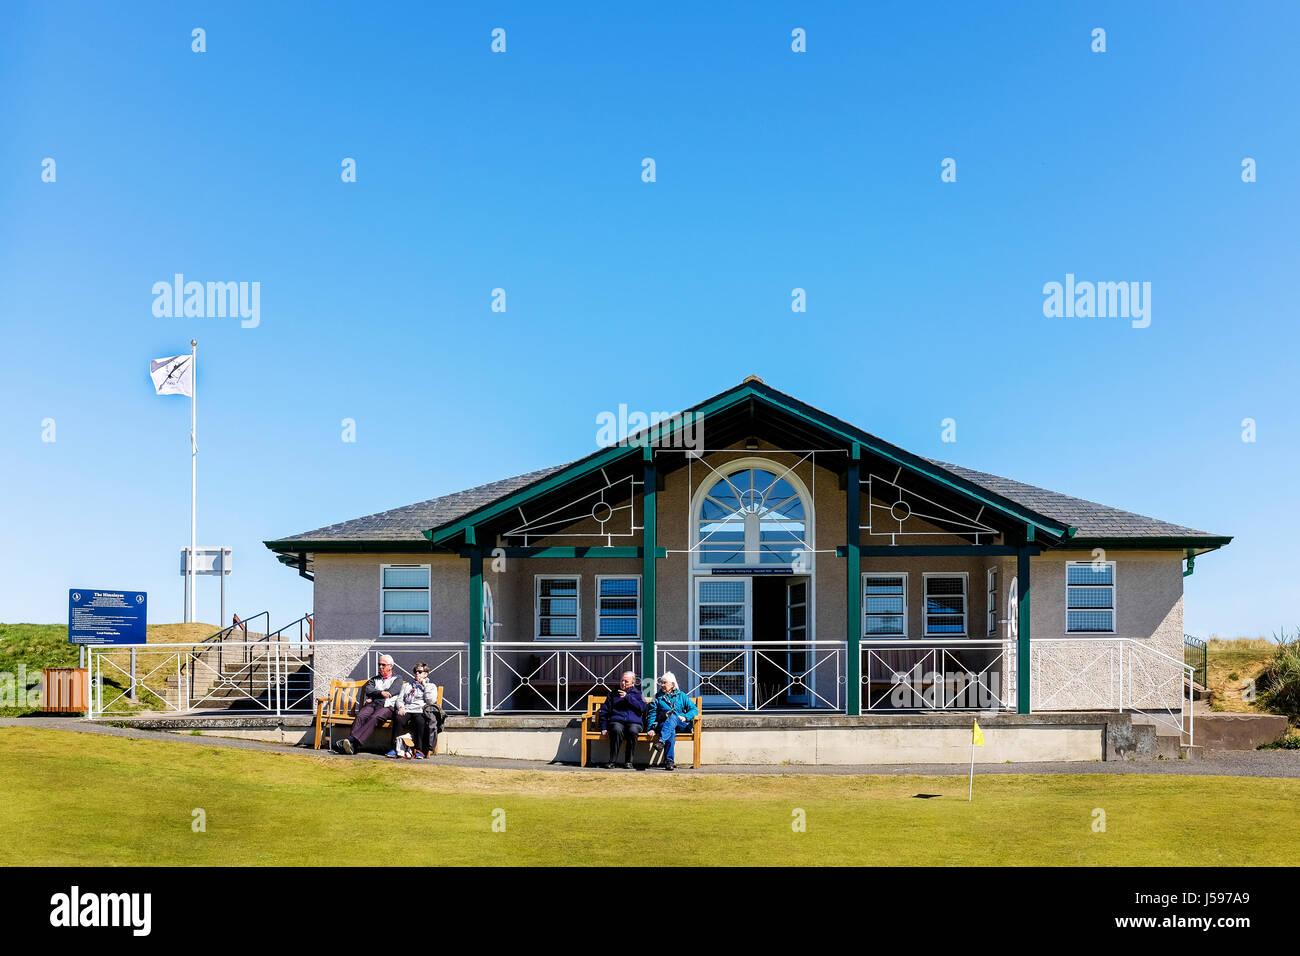 Clubhouse per St Andrews Ladies Putting Club, l'Himalaya Corso, St Andrews Fife, Scozia, Regno Unito Immagini Stock